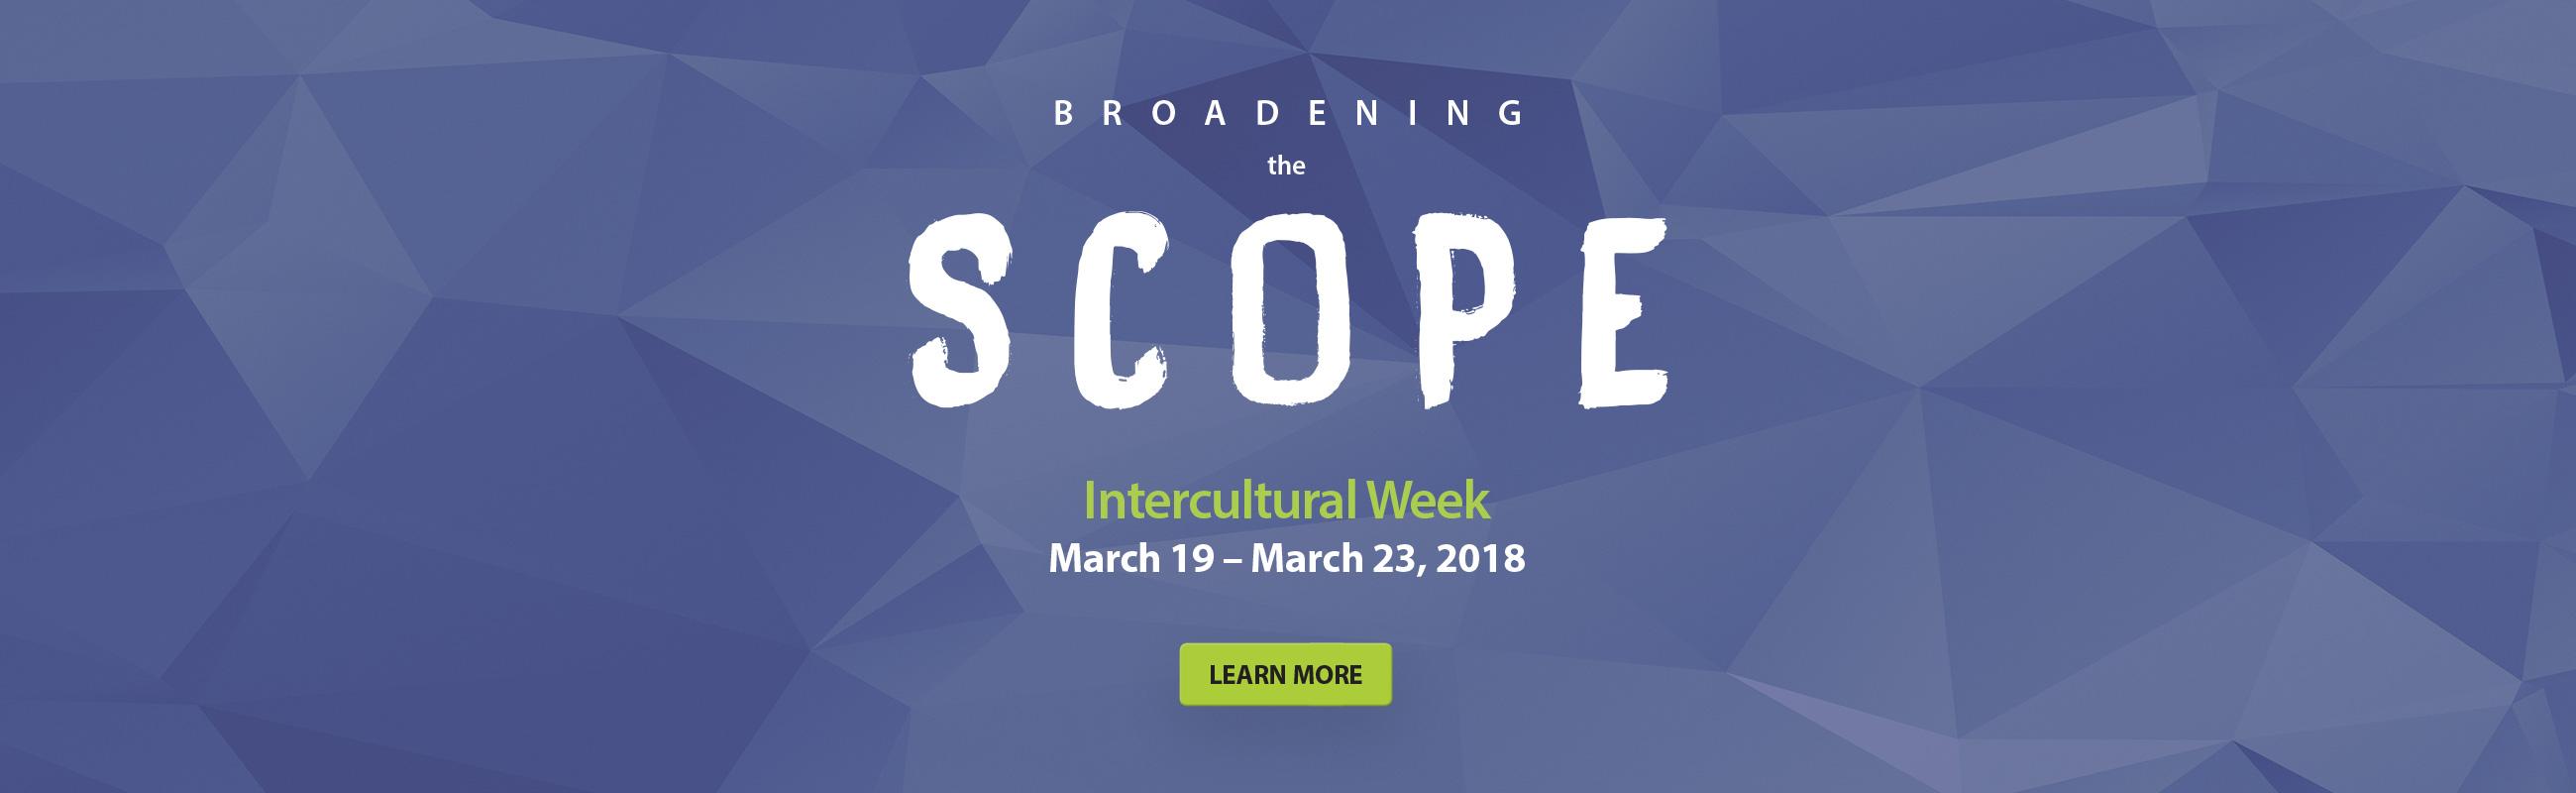 Intercultural Week 2018